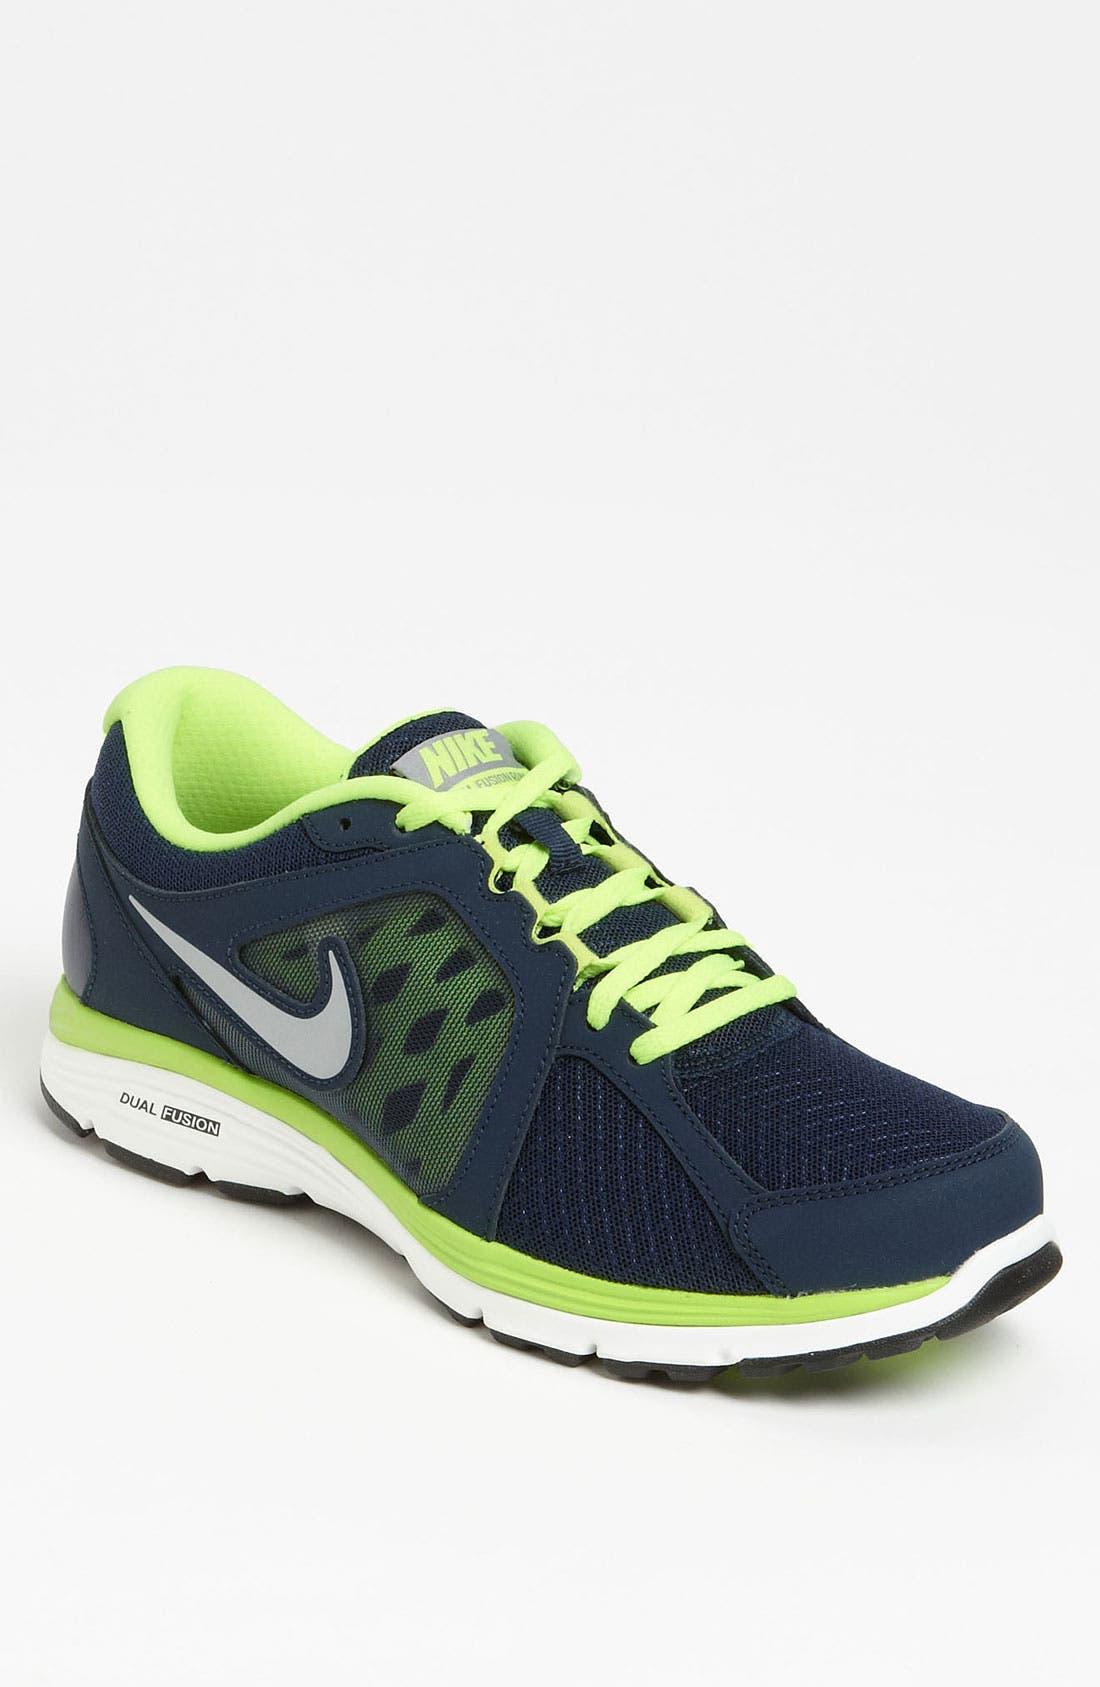 Alternate Image 1 Selected - Nike 'Dual Fusion Run' Running Shoe (Men)